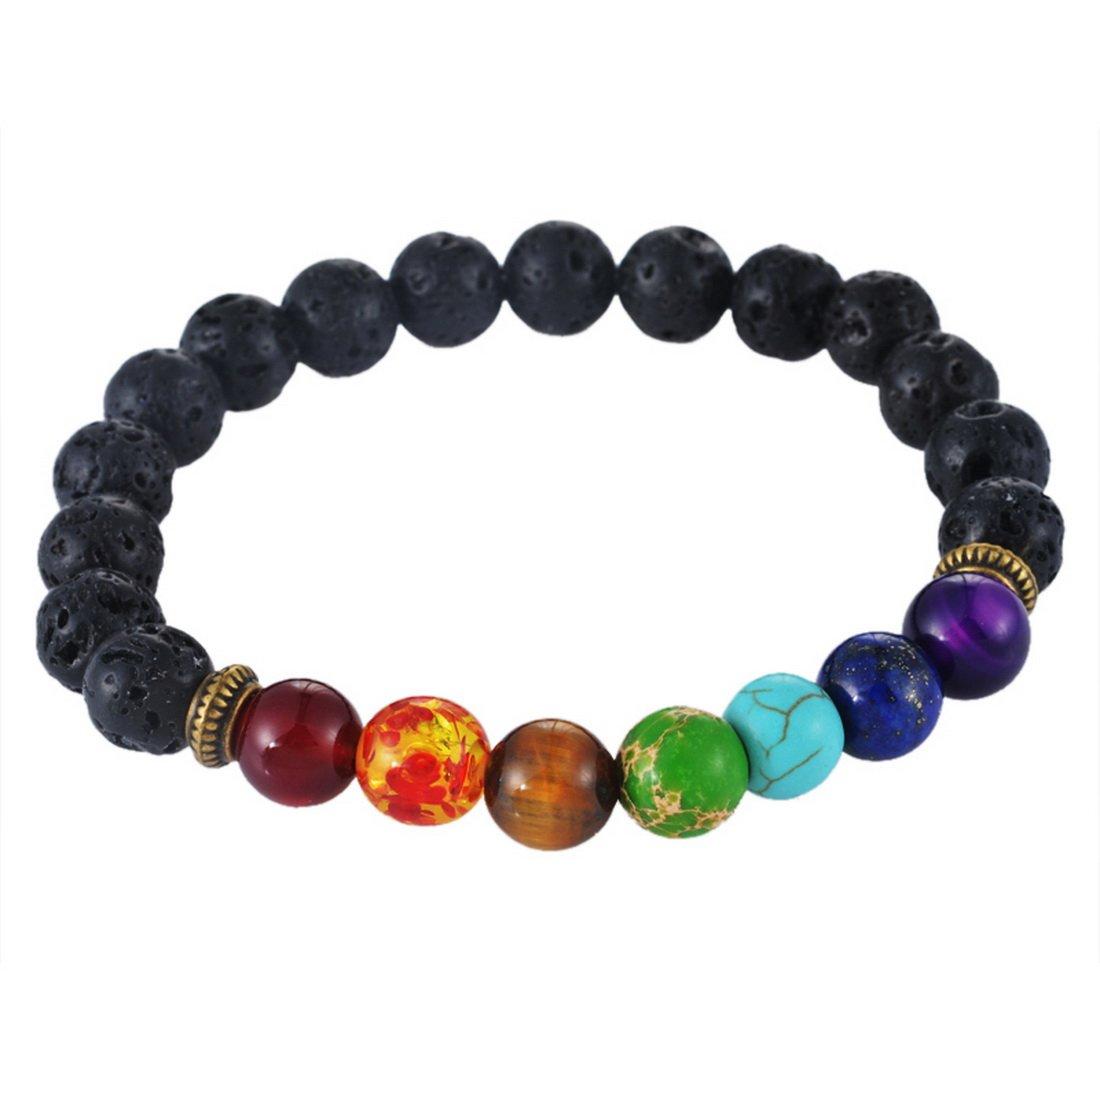 MJartoria Lava Rock Turquoise Beads Charka Reiki Black Healing Energy Stone Bracelet